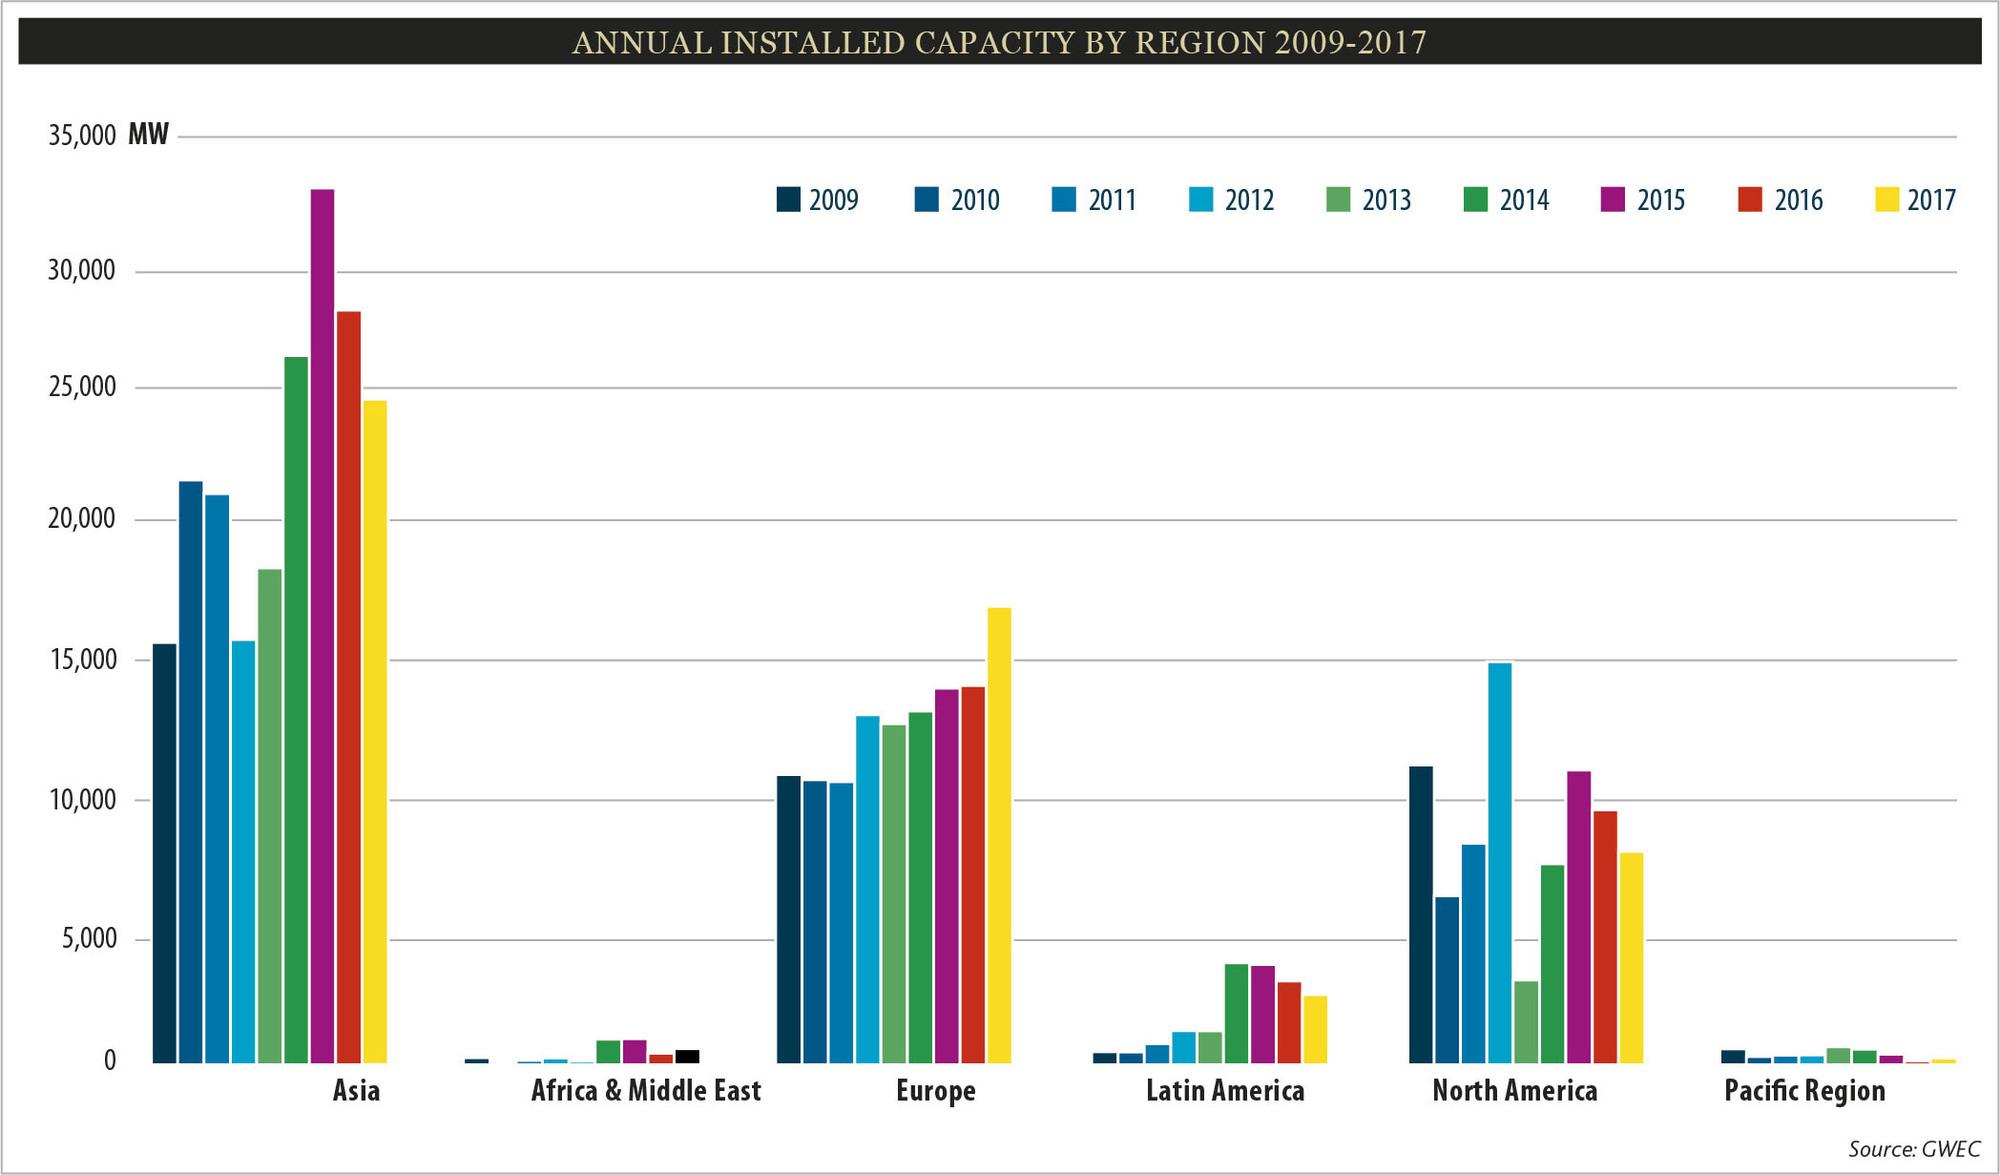 Annual_Installed_Capacity_by_Region_2009-2017.jpg (2096×1231)